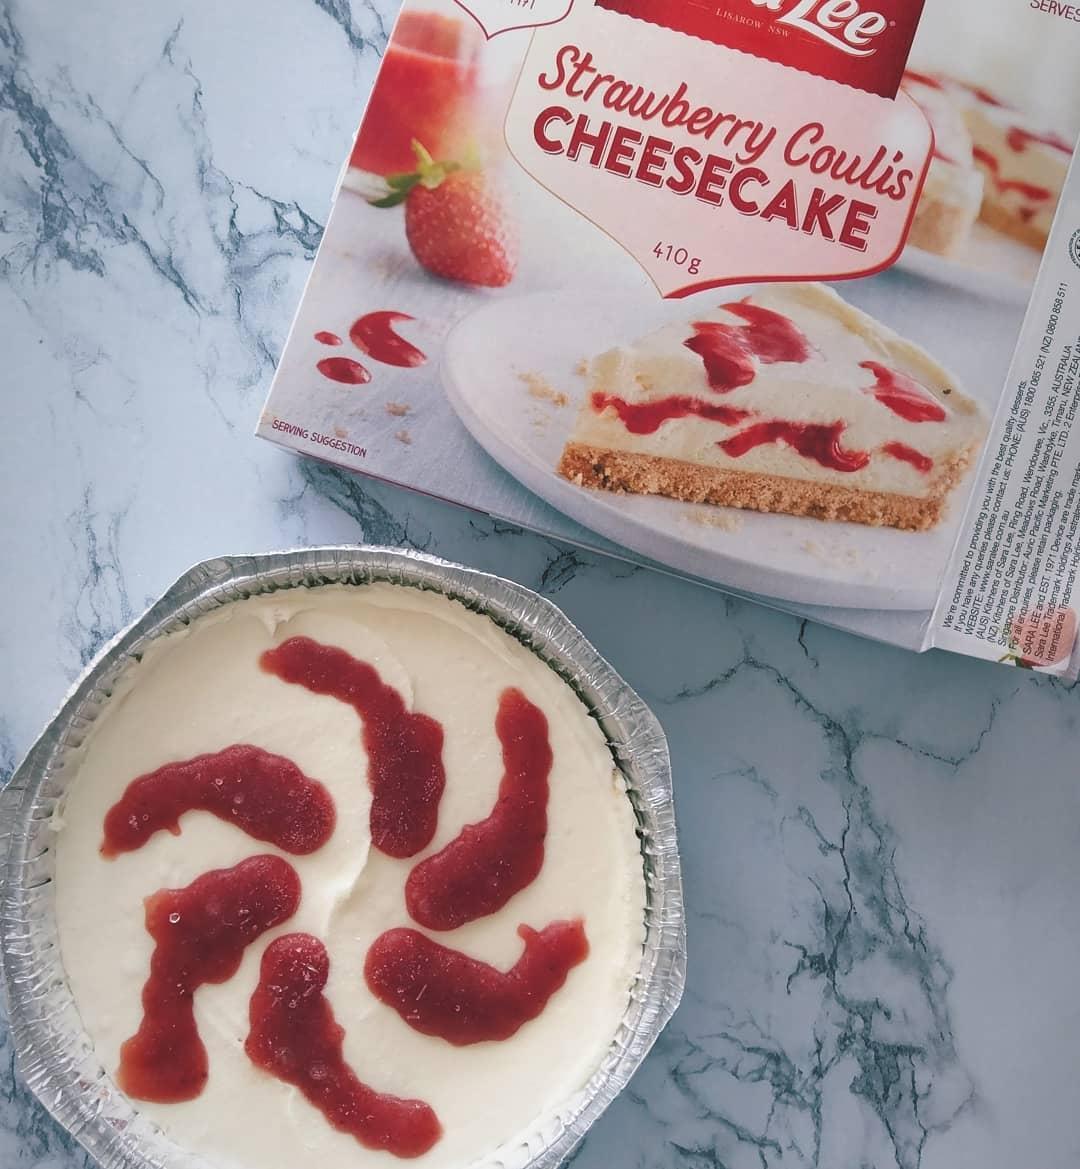 Sara Lee Salted Caramel - Strawberry Cheesecake